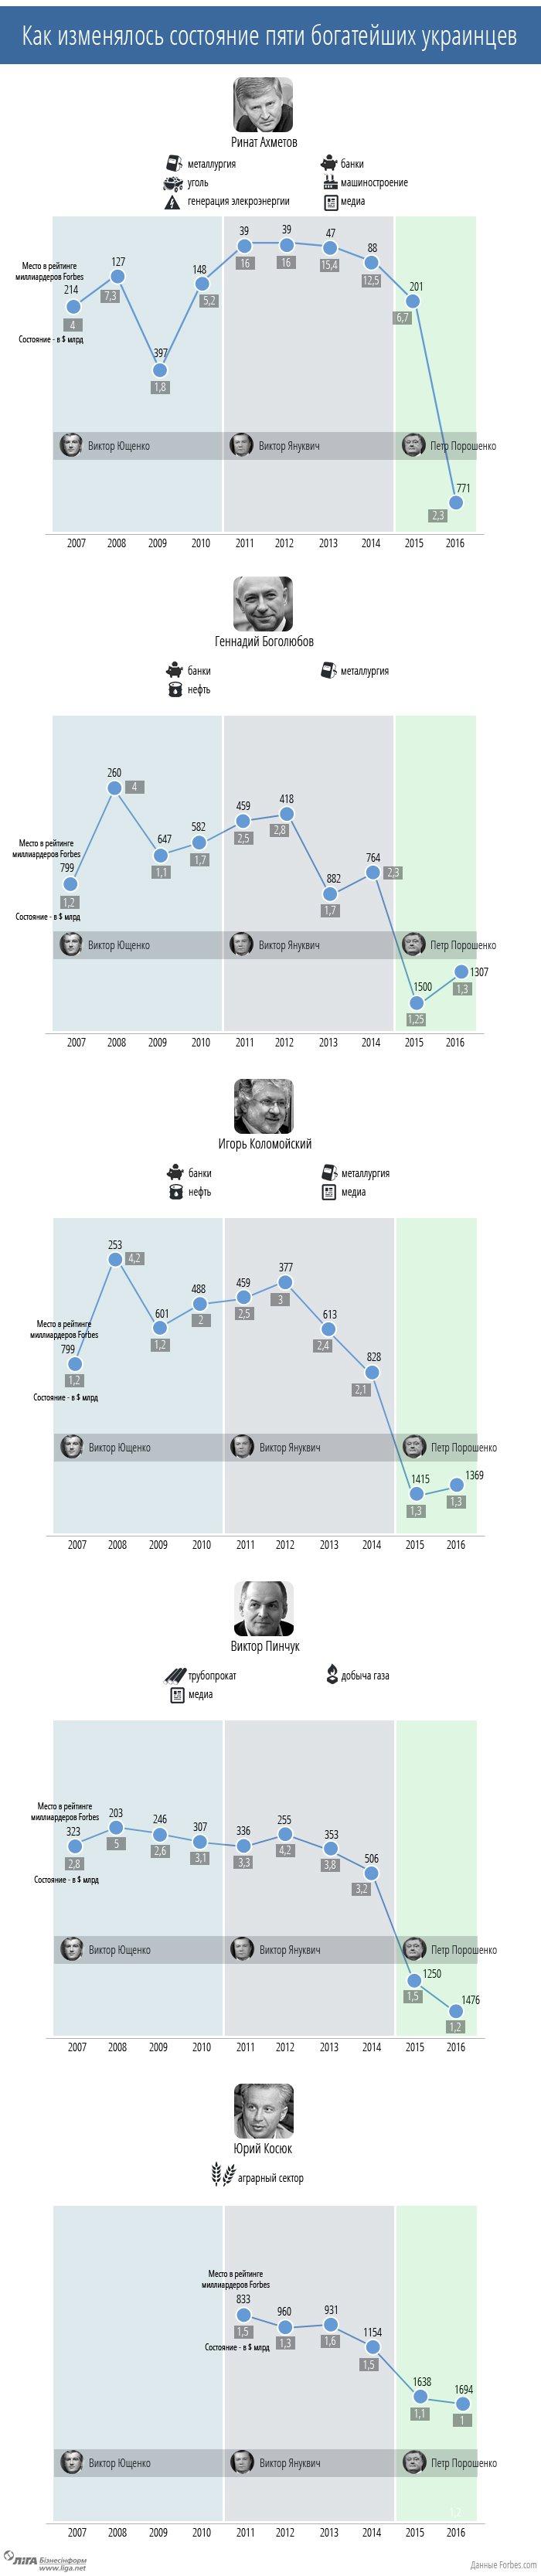 Как богатели и беднели украинские миллиардеры (ИНФОГРАФИКА) (фото) - фото 1